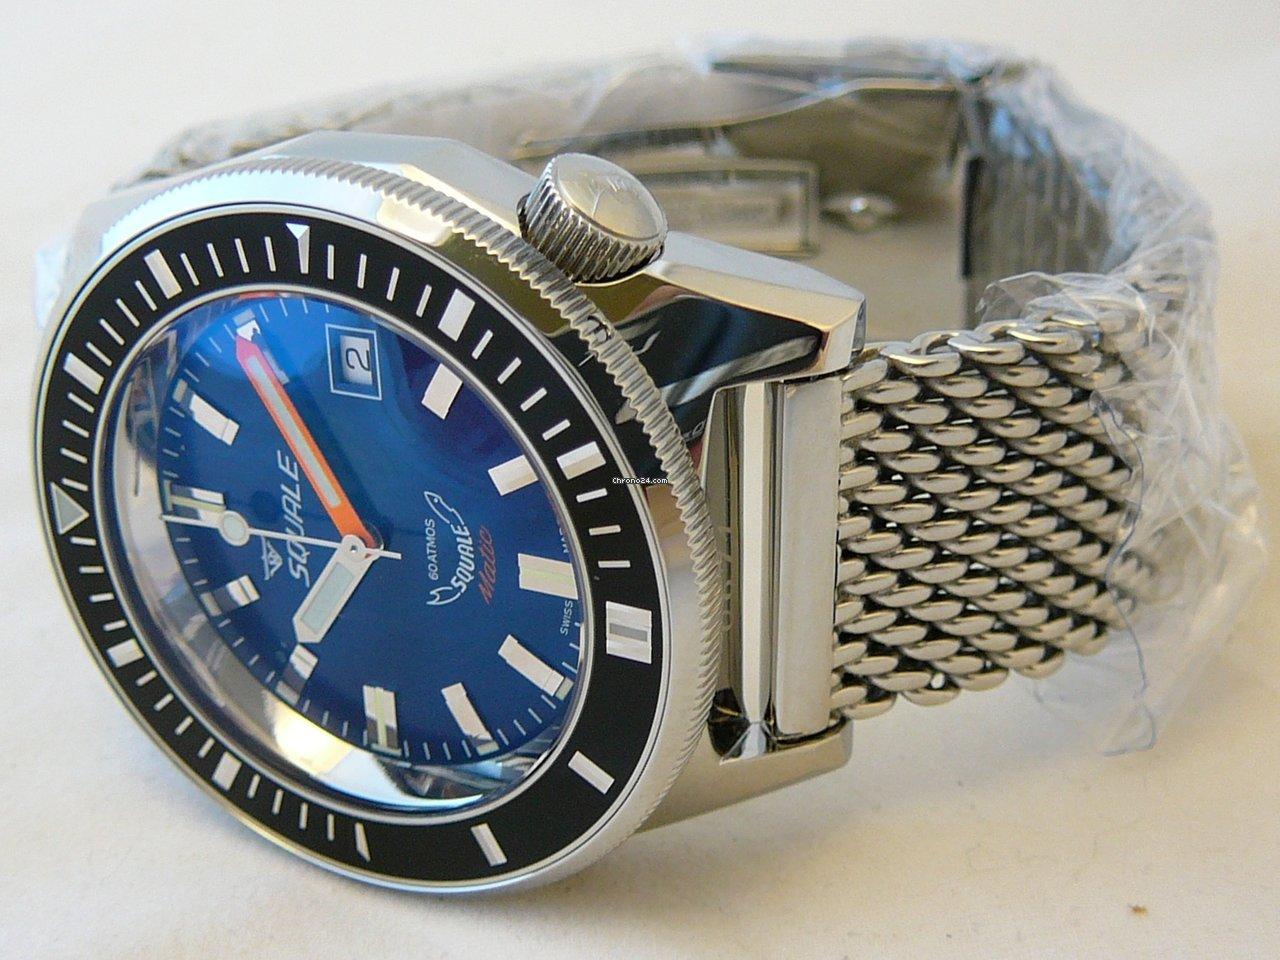 Matic DialBlack Blue 600 Bracelet Squale MtShiny BezelMesh 7vYIb6gfy